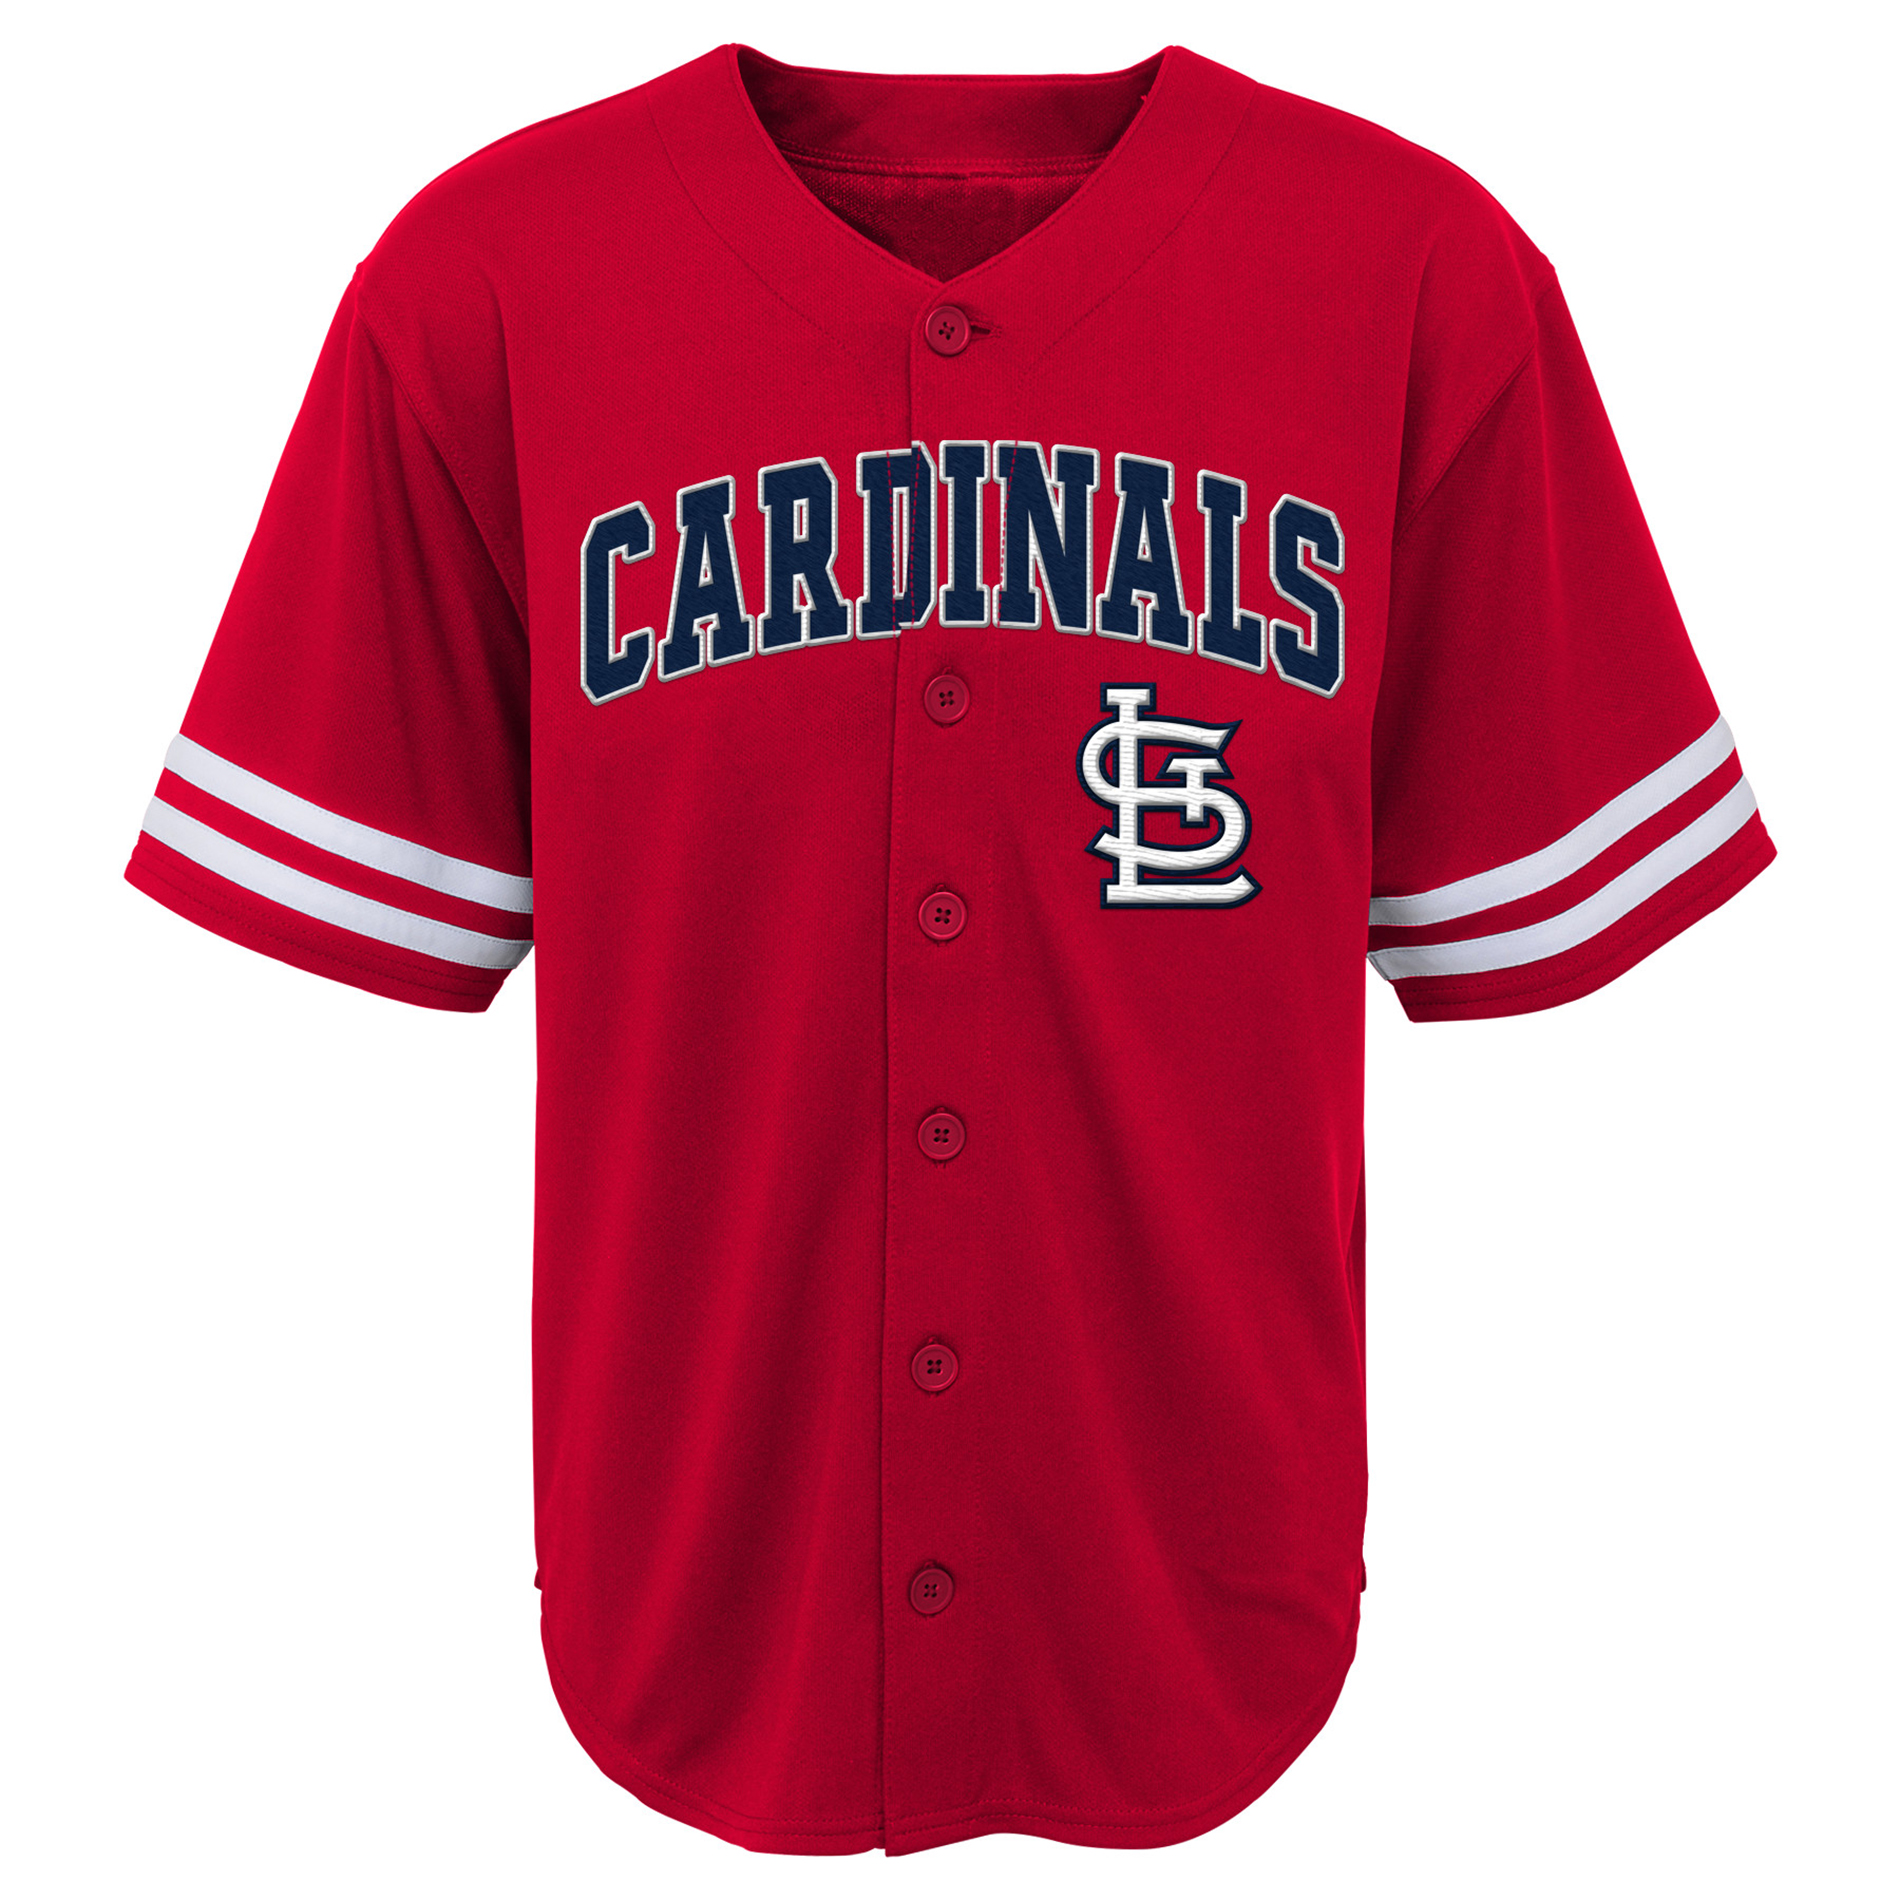 petite MLB Toddler Boys' Short-Sleeve Jersey - St. Louis Cardinals, Size: 2T im test